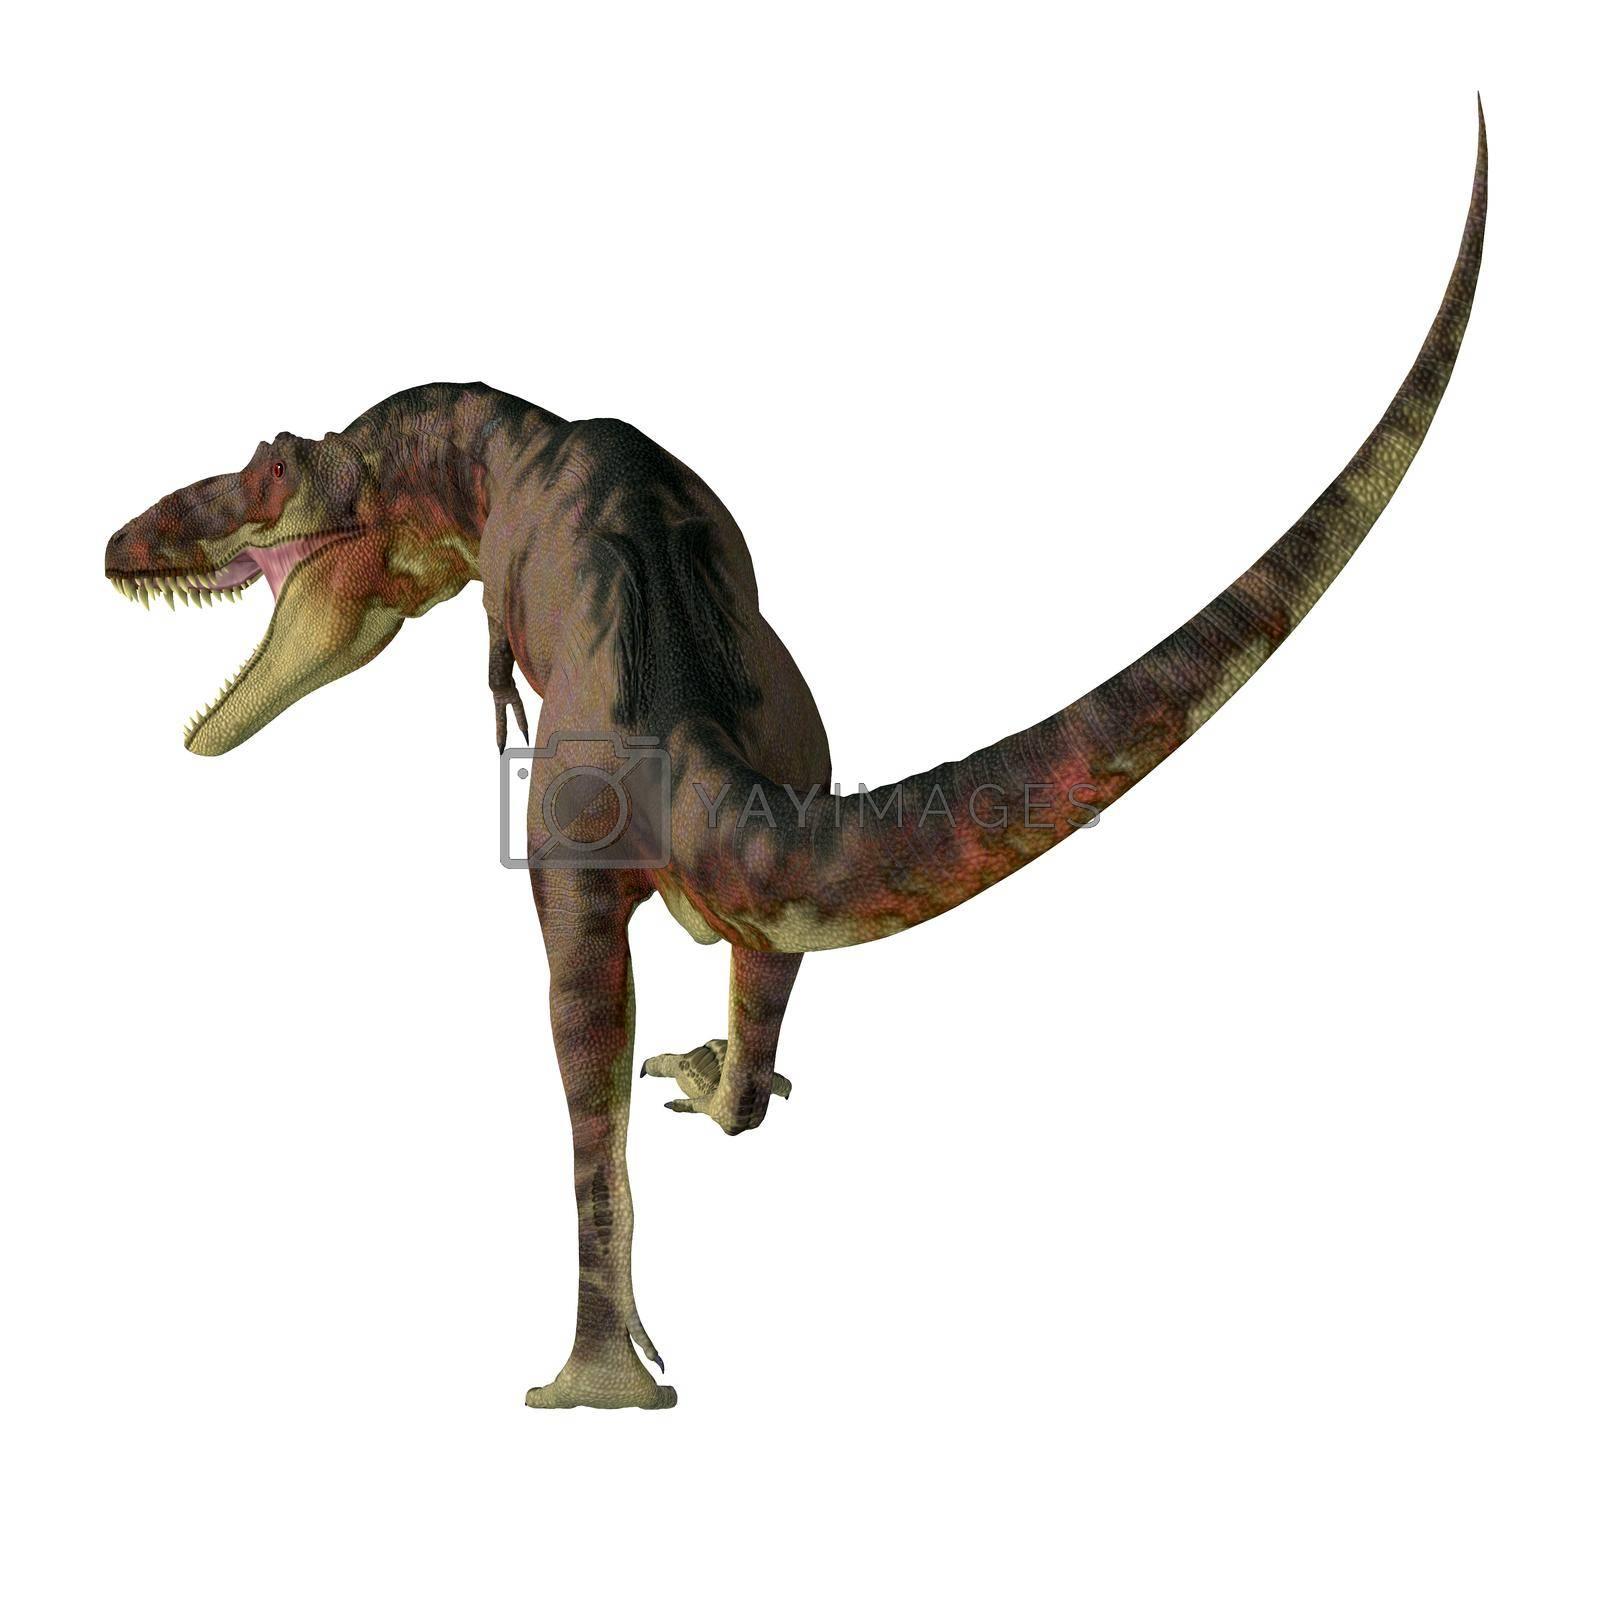 Royalty free image of Daspletosaurus Dinosaur Carnivore by Catmando